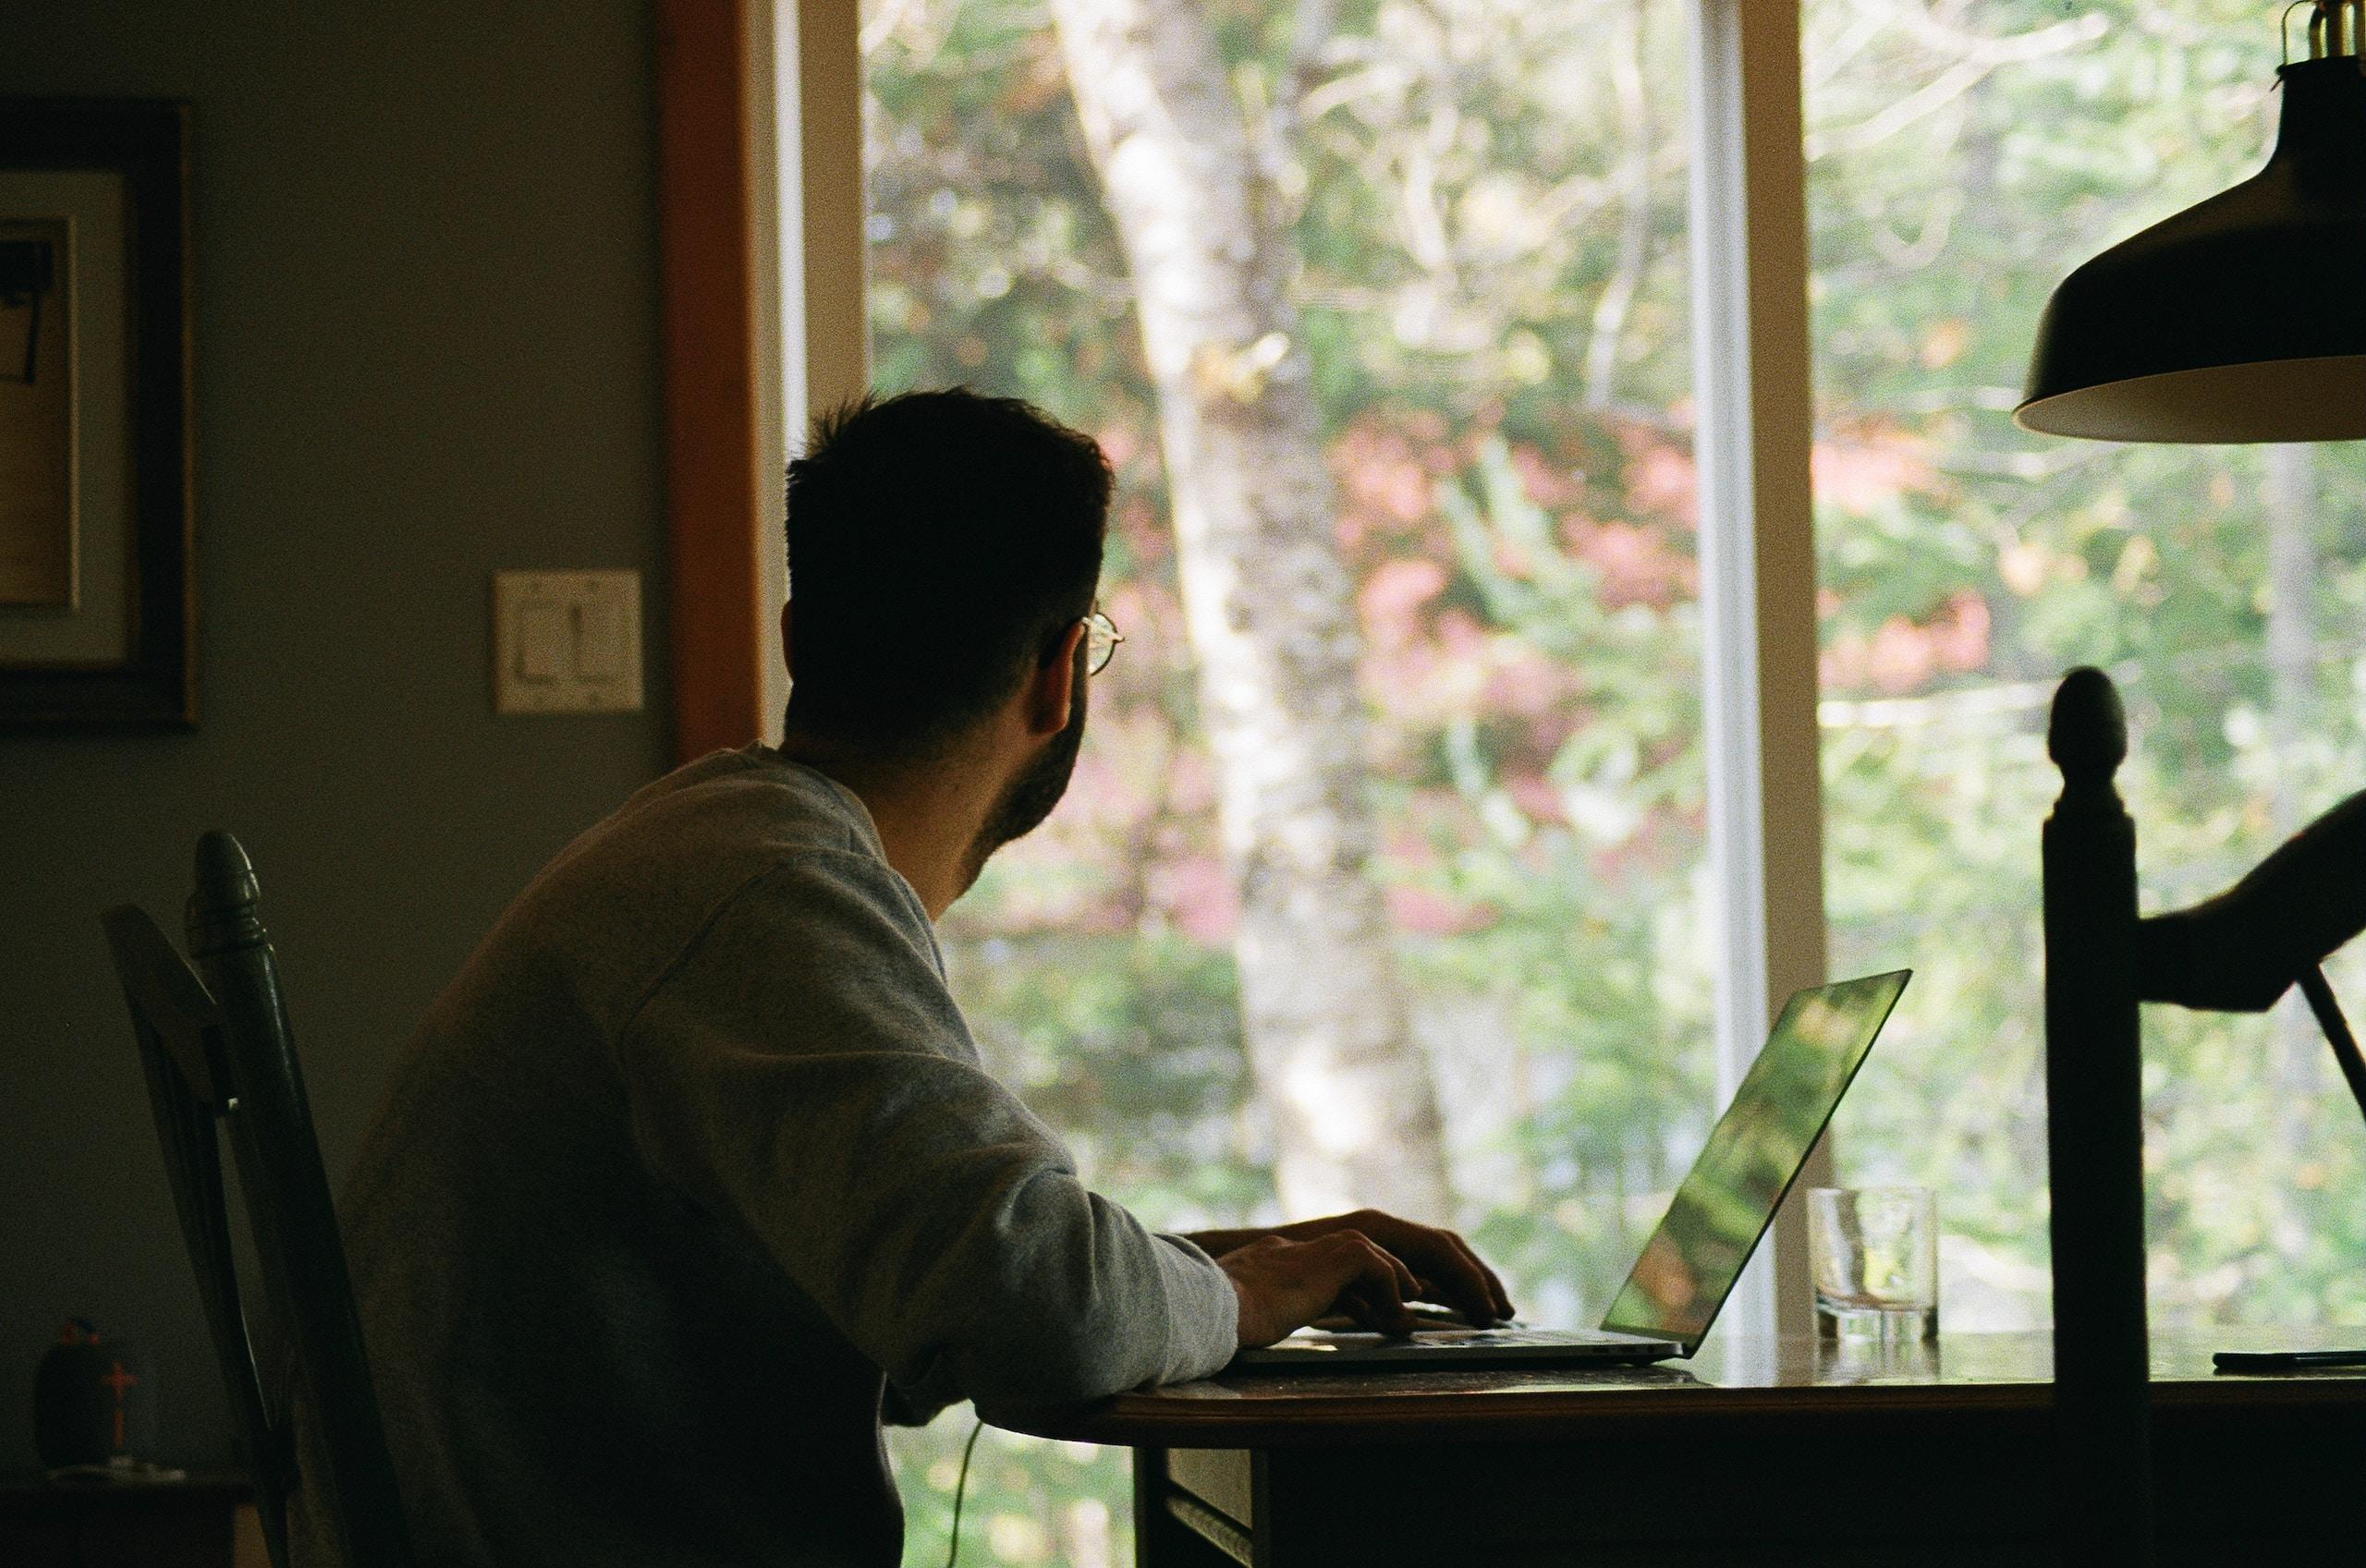 man in gray hoodie using laptop computer